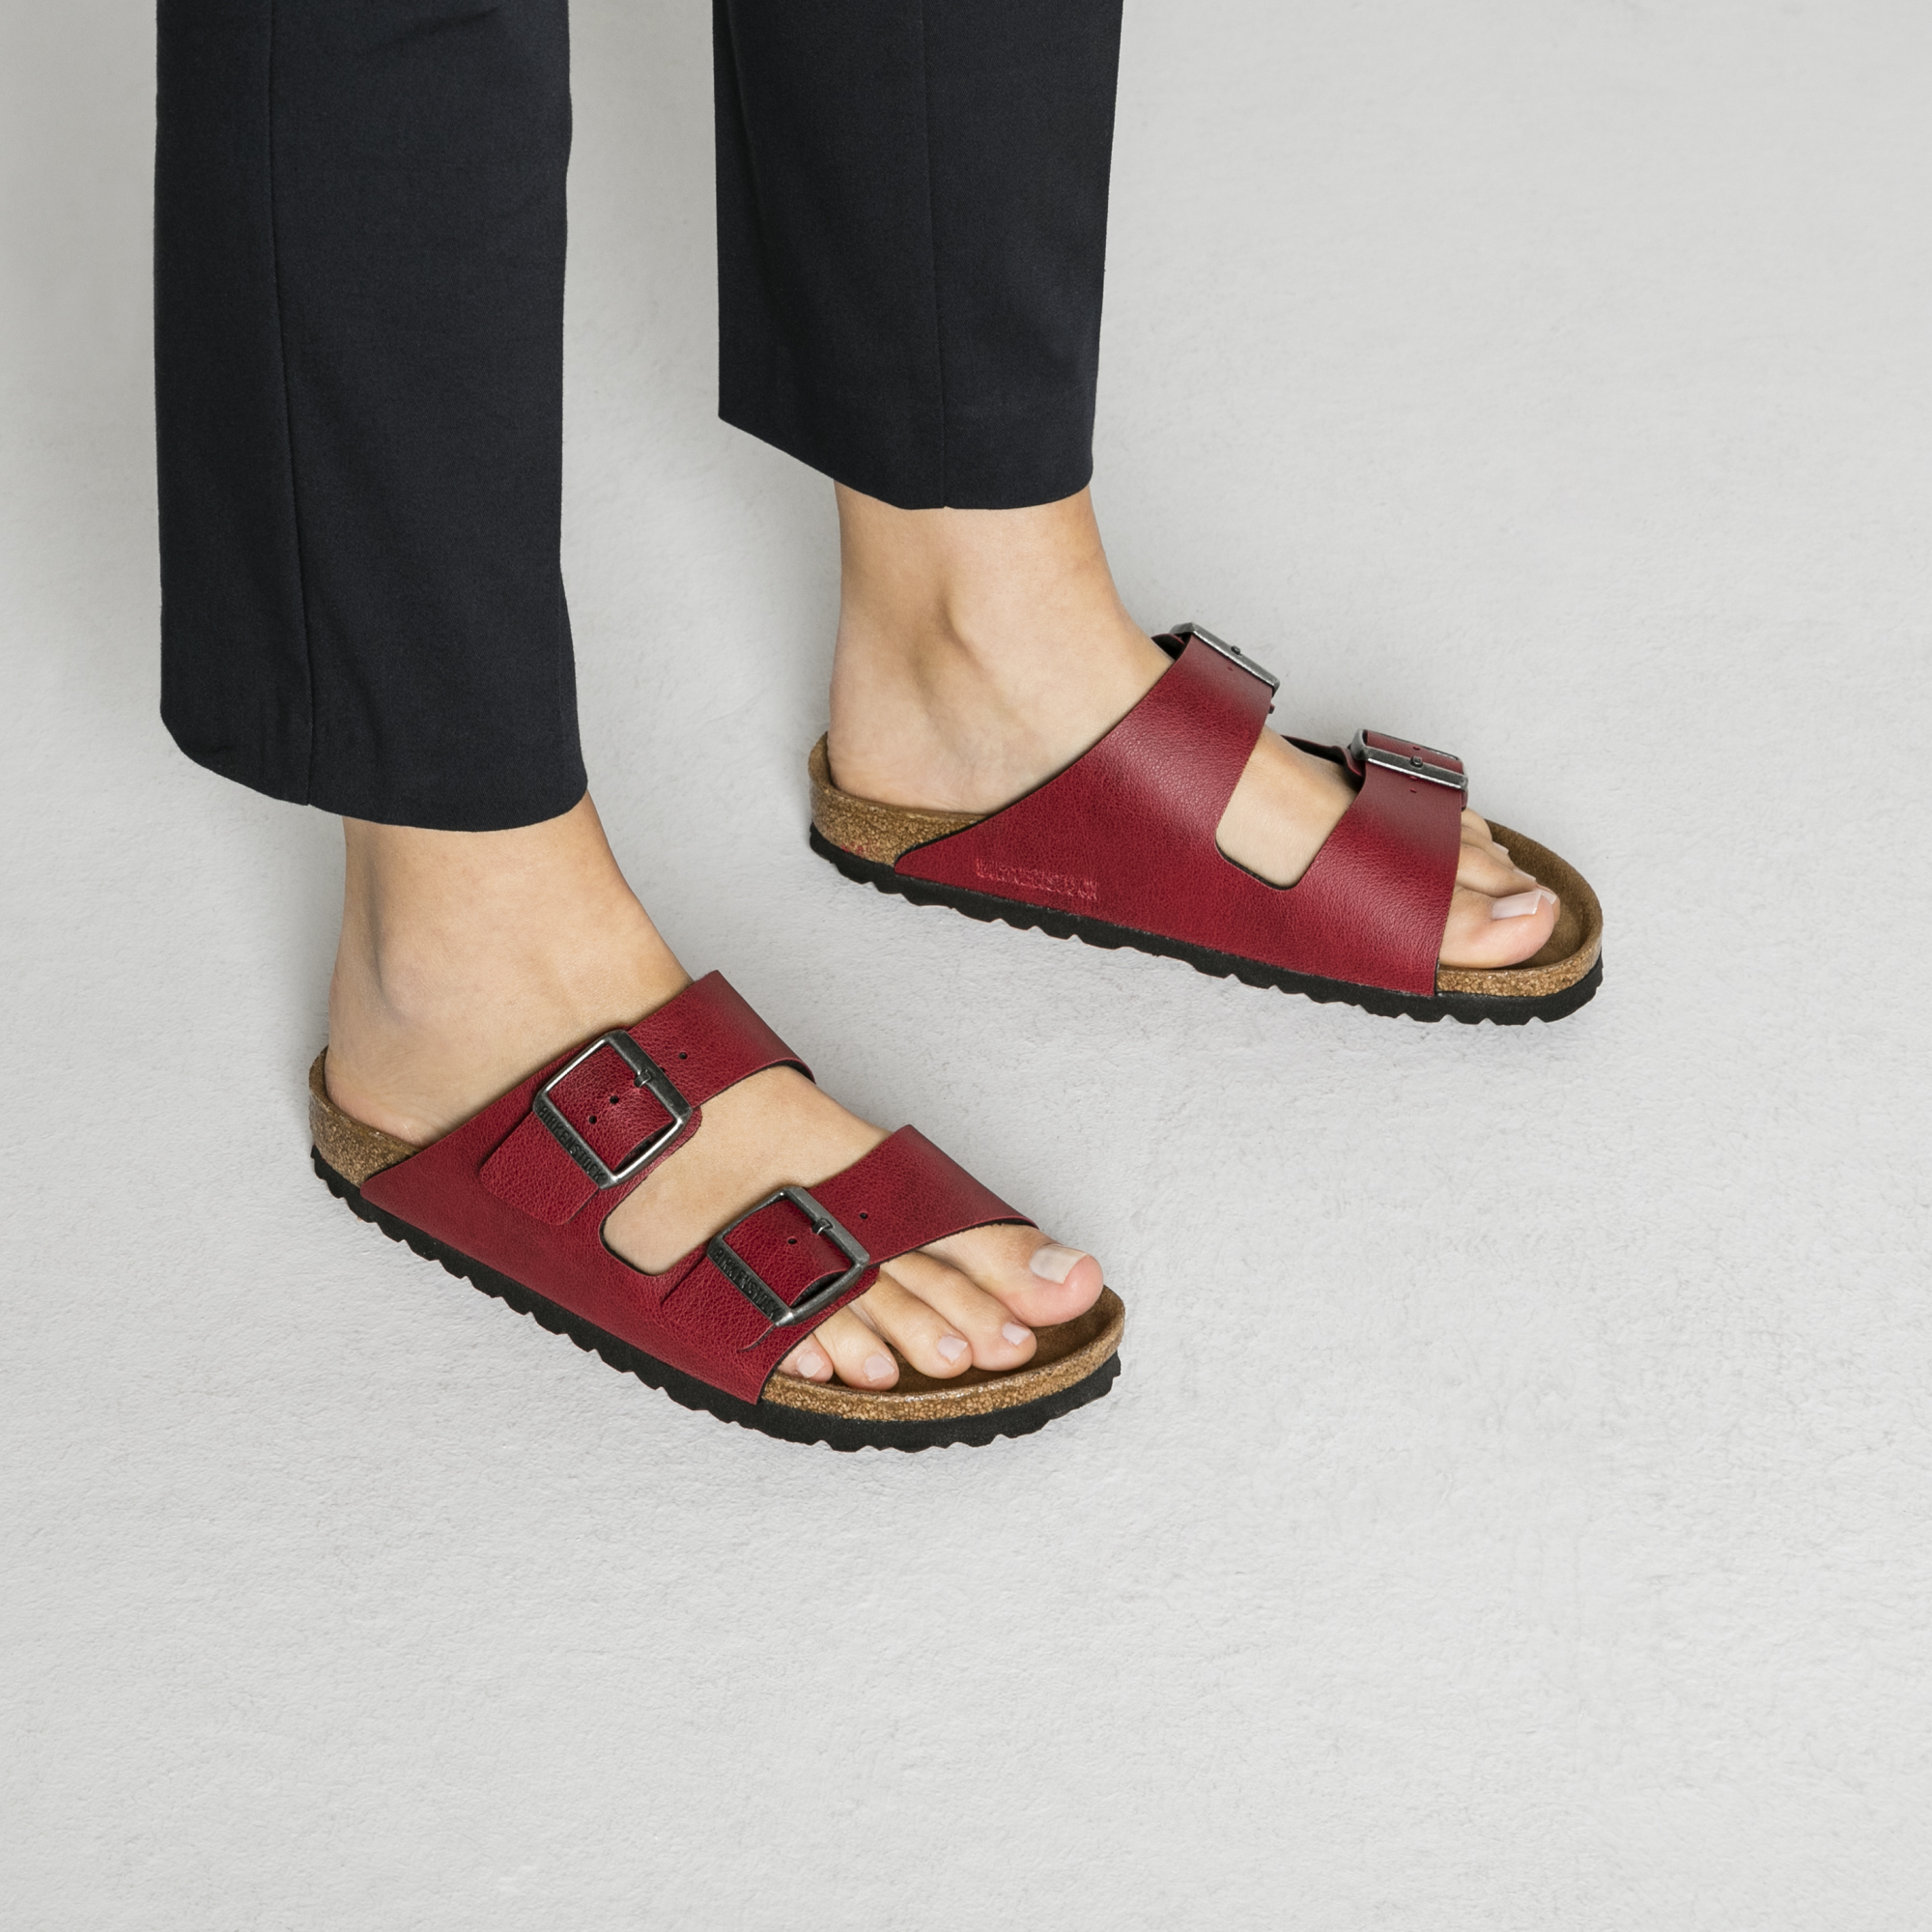 new! Birkenstock Arizona Pull Up Sandal